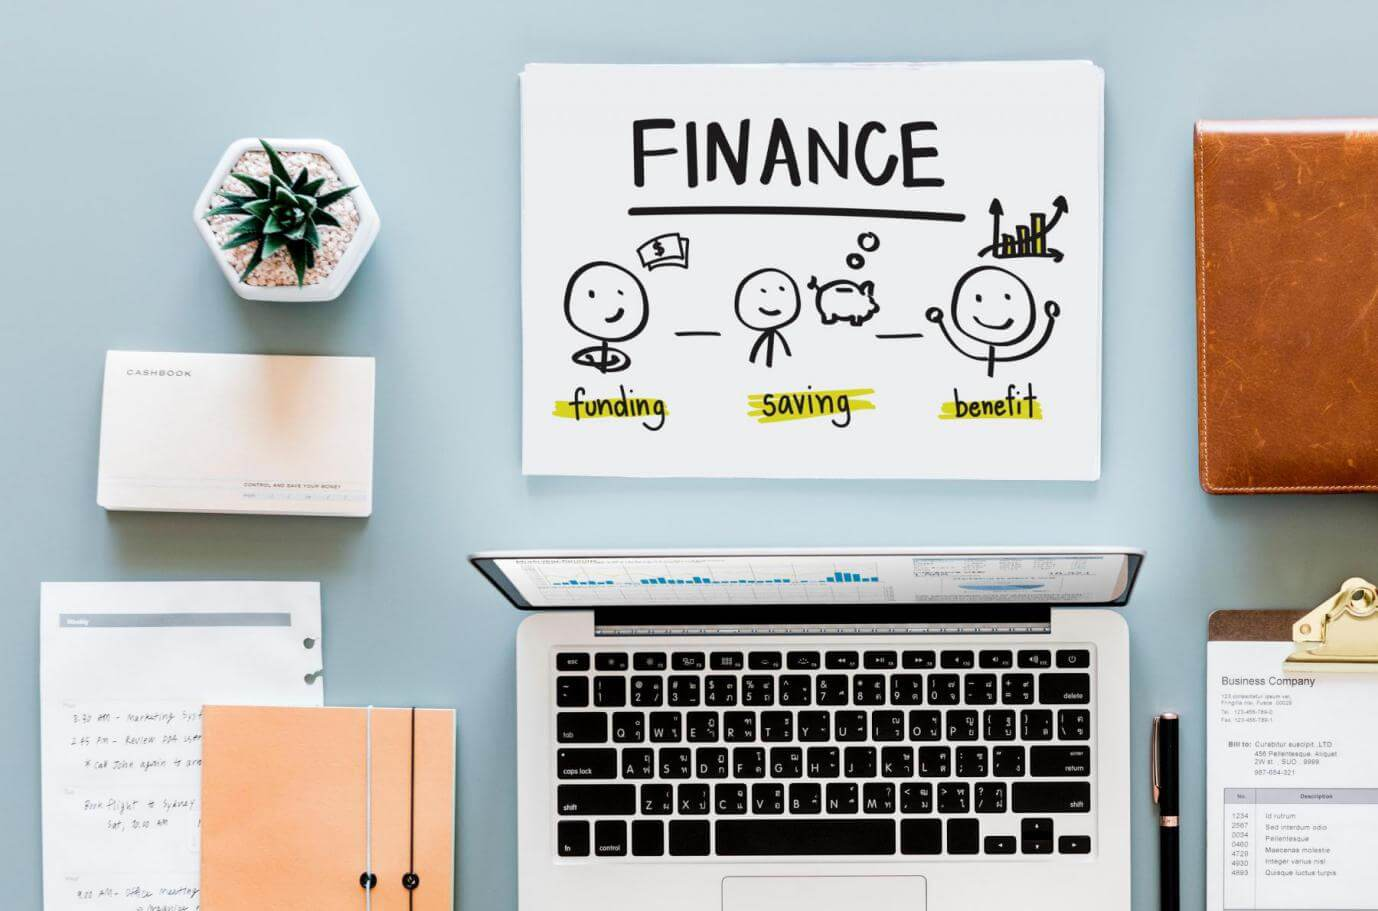 Popular Financing Schemes